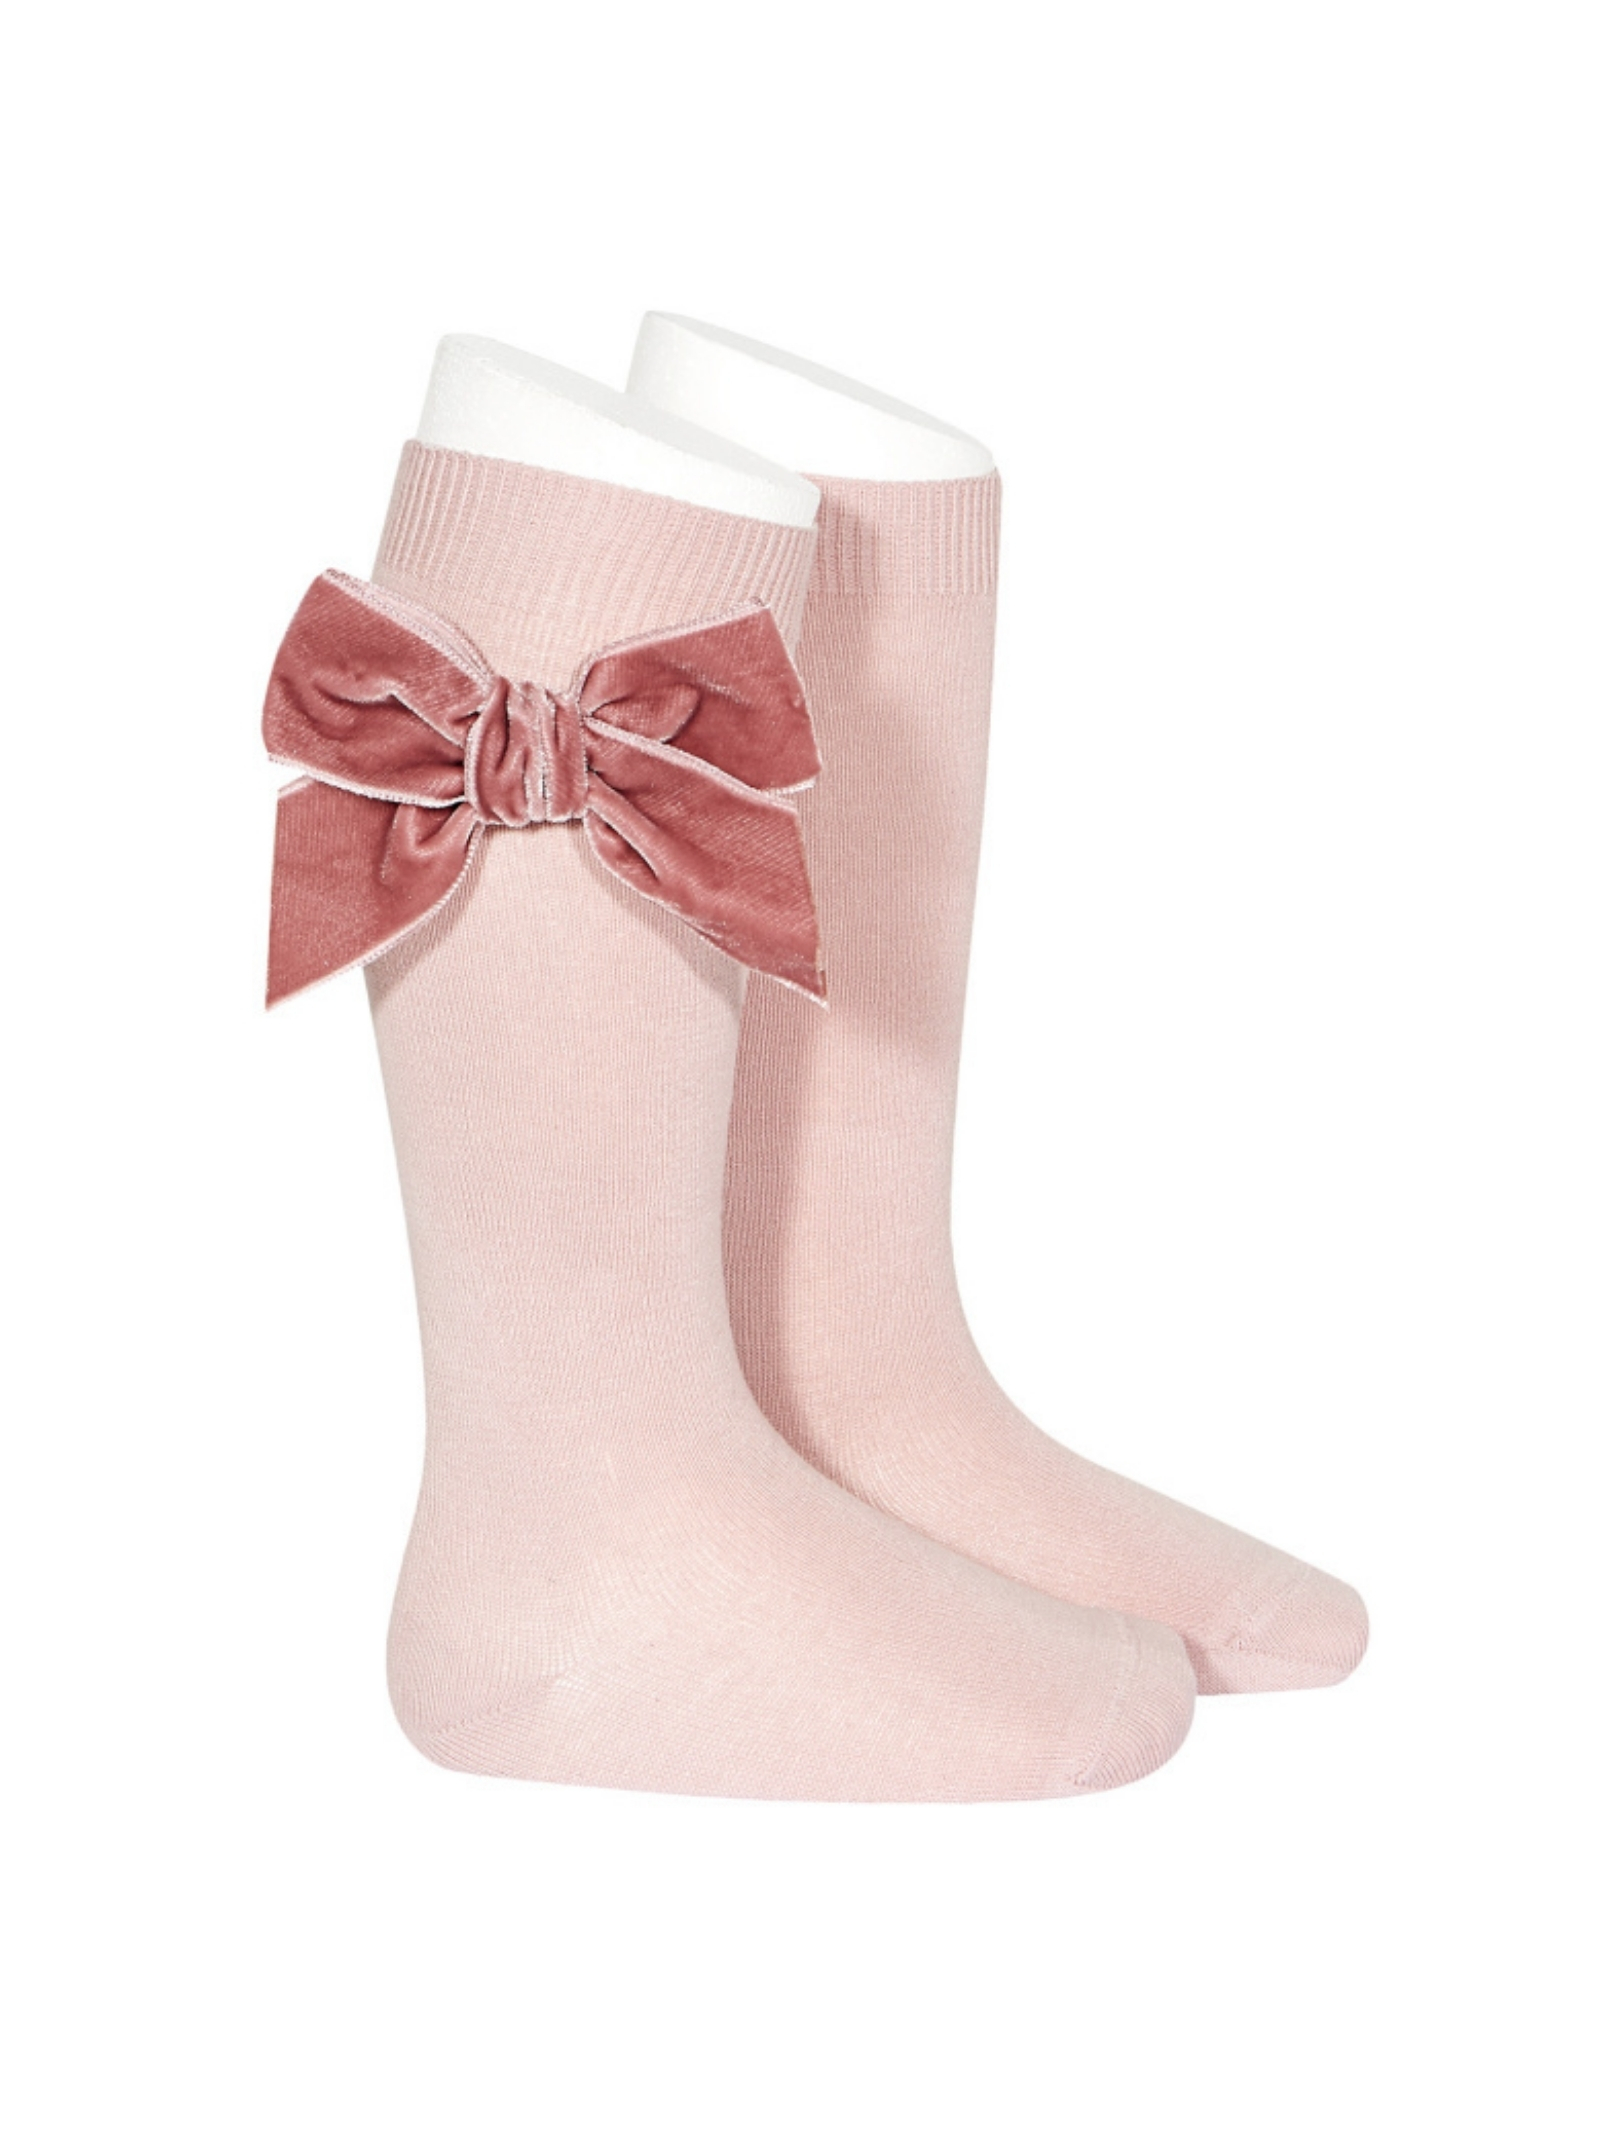 Parisian Bow Socks for Girls CONDOR | Socks | 24892526